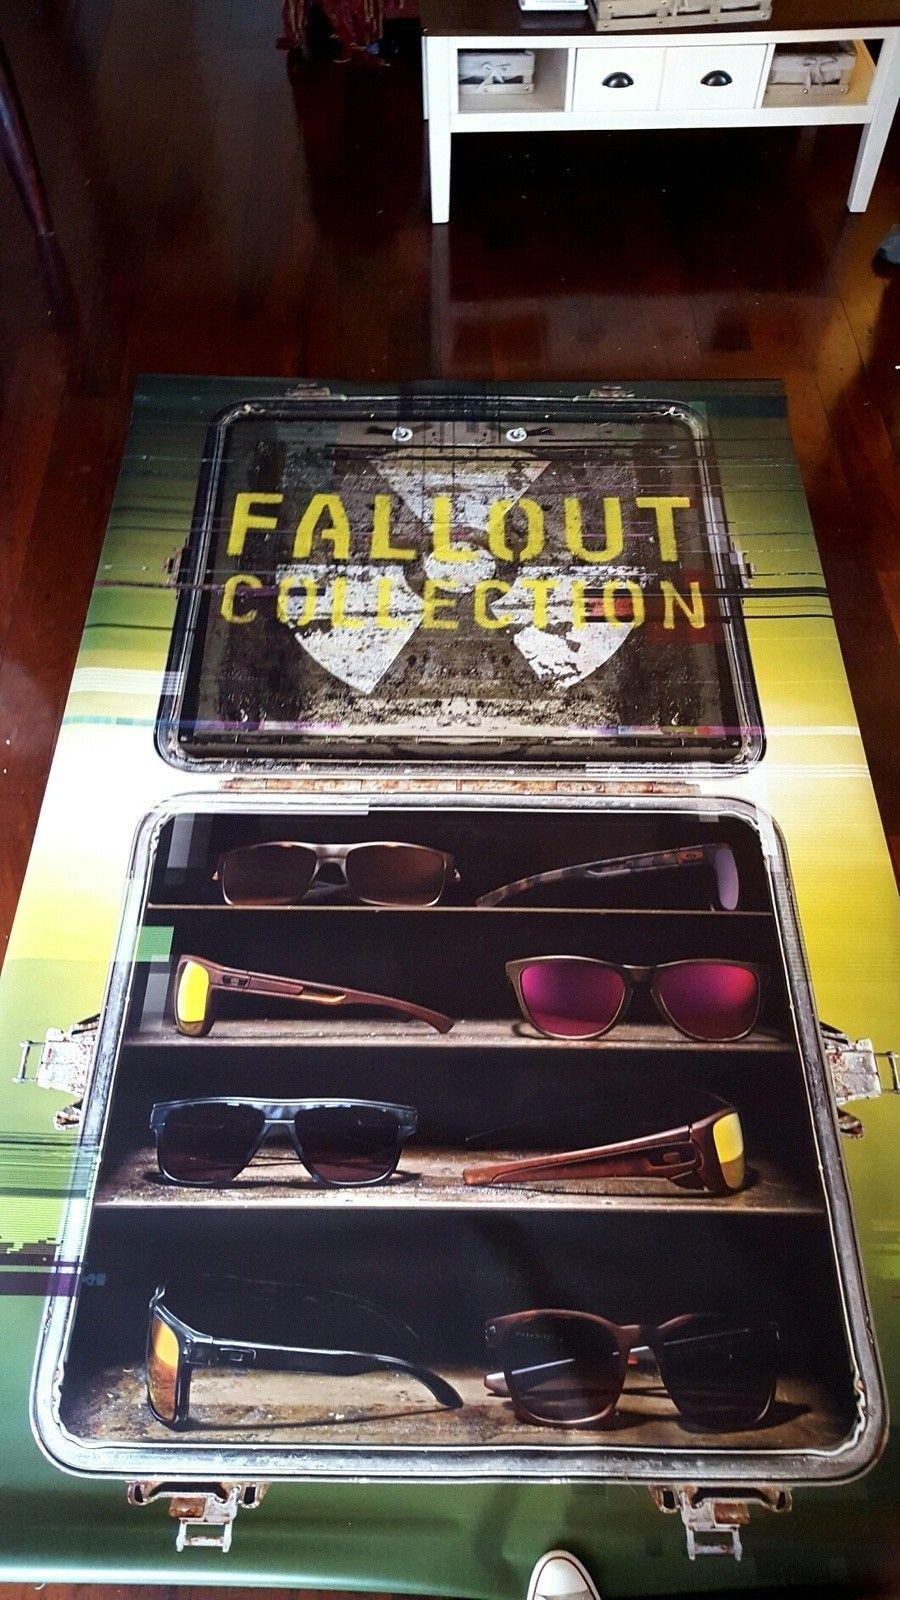 3 Large Vinyl Window Banners. Fallout & Carbon Blade Ferrari - 45B1xBE.jpg